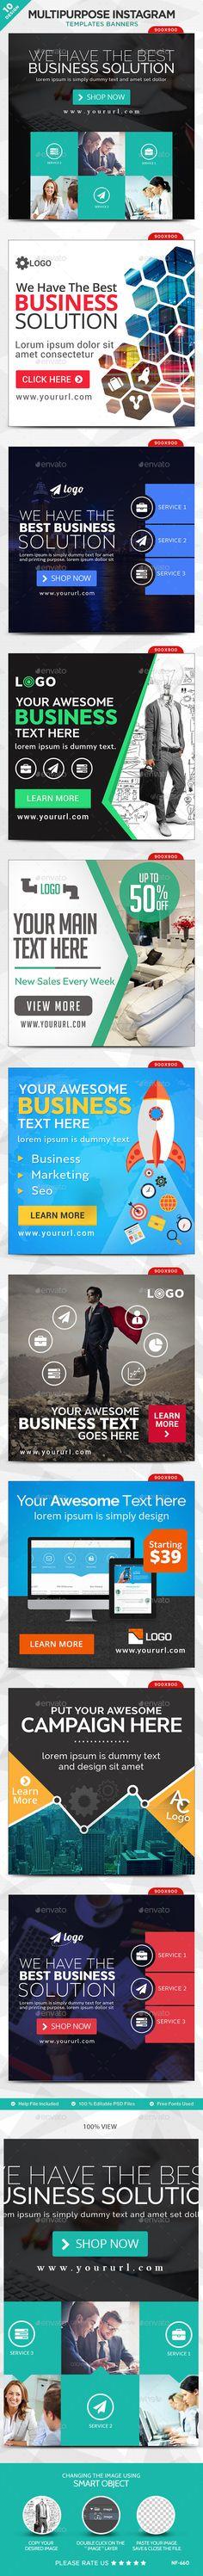 Multipurpose Instagram Templates - 10 Designs #design #ads Download: http://graphicriver.net/item/multipurpose-instagram-templates-10-designs/12959710?ref=ksioks